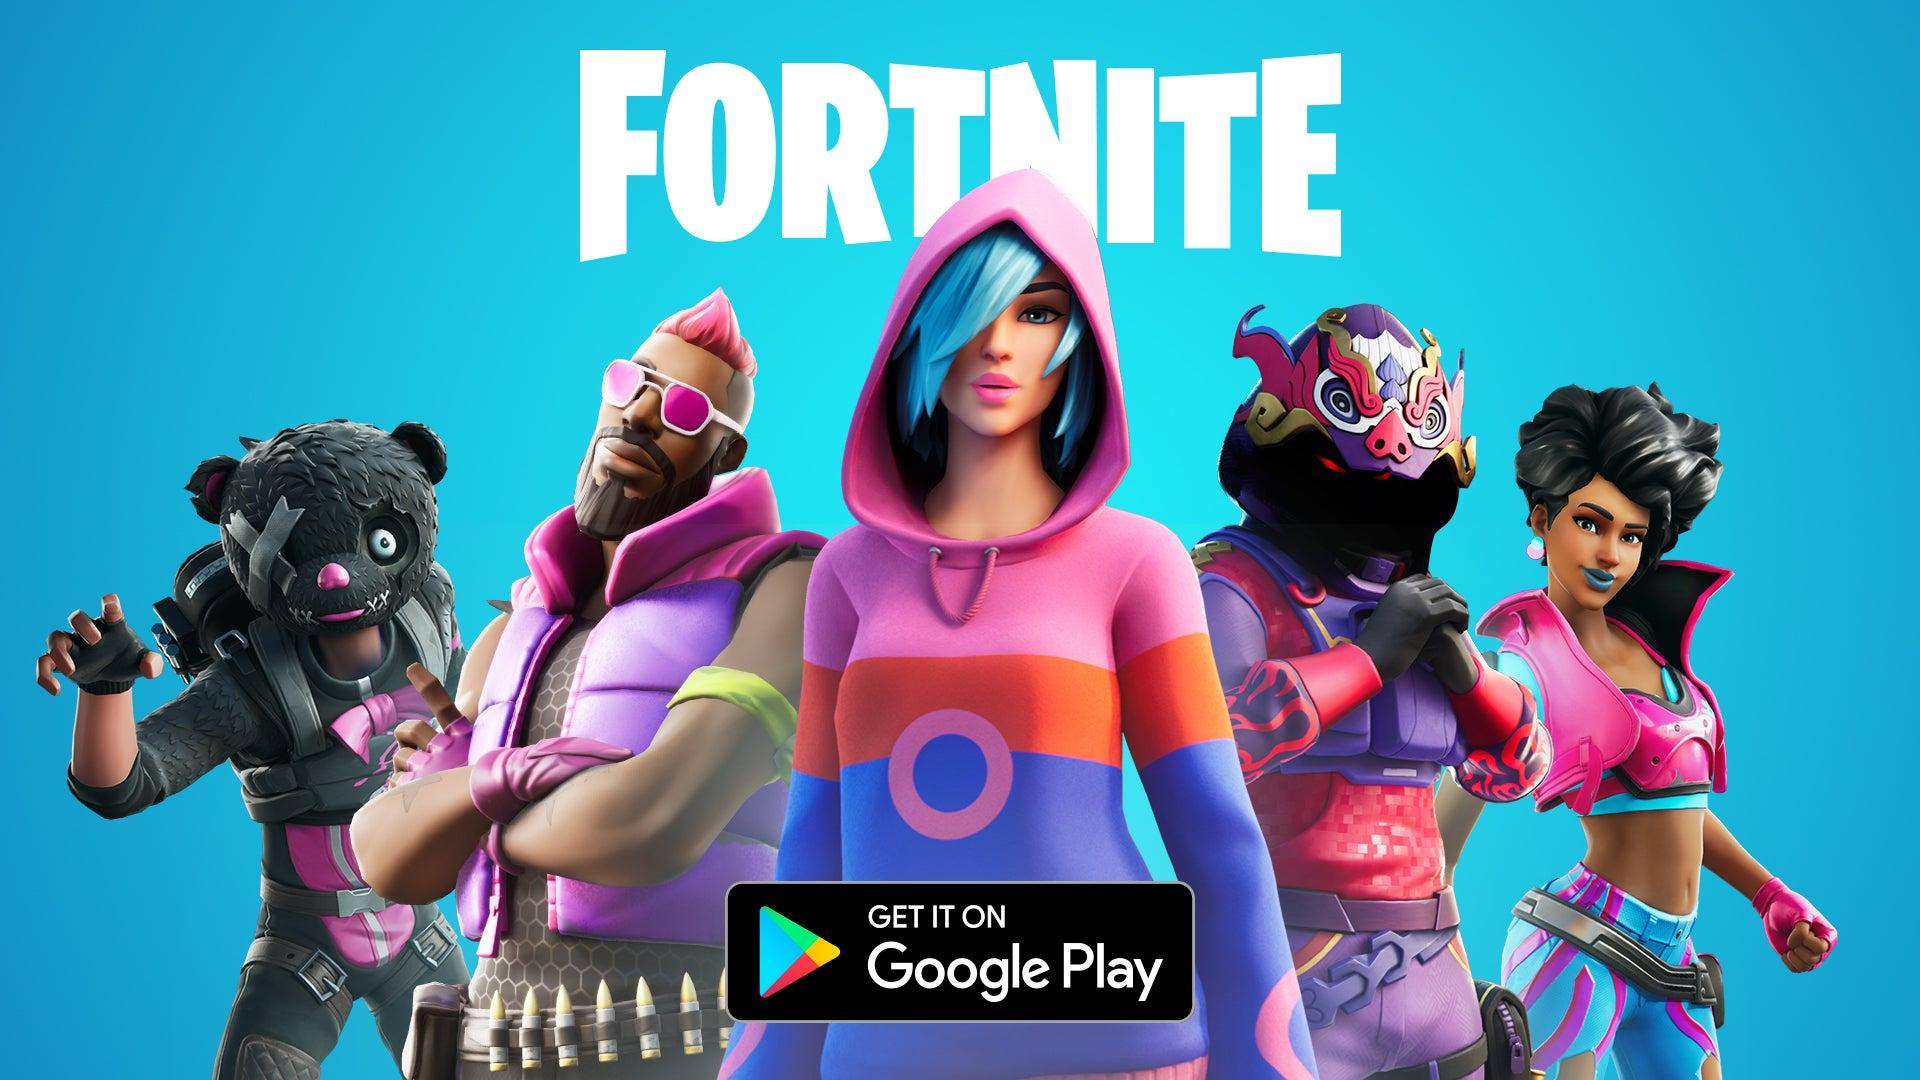 Fortnite Apple iOS Epic Games Google